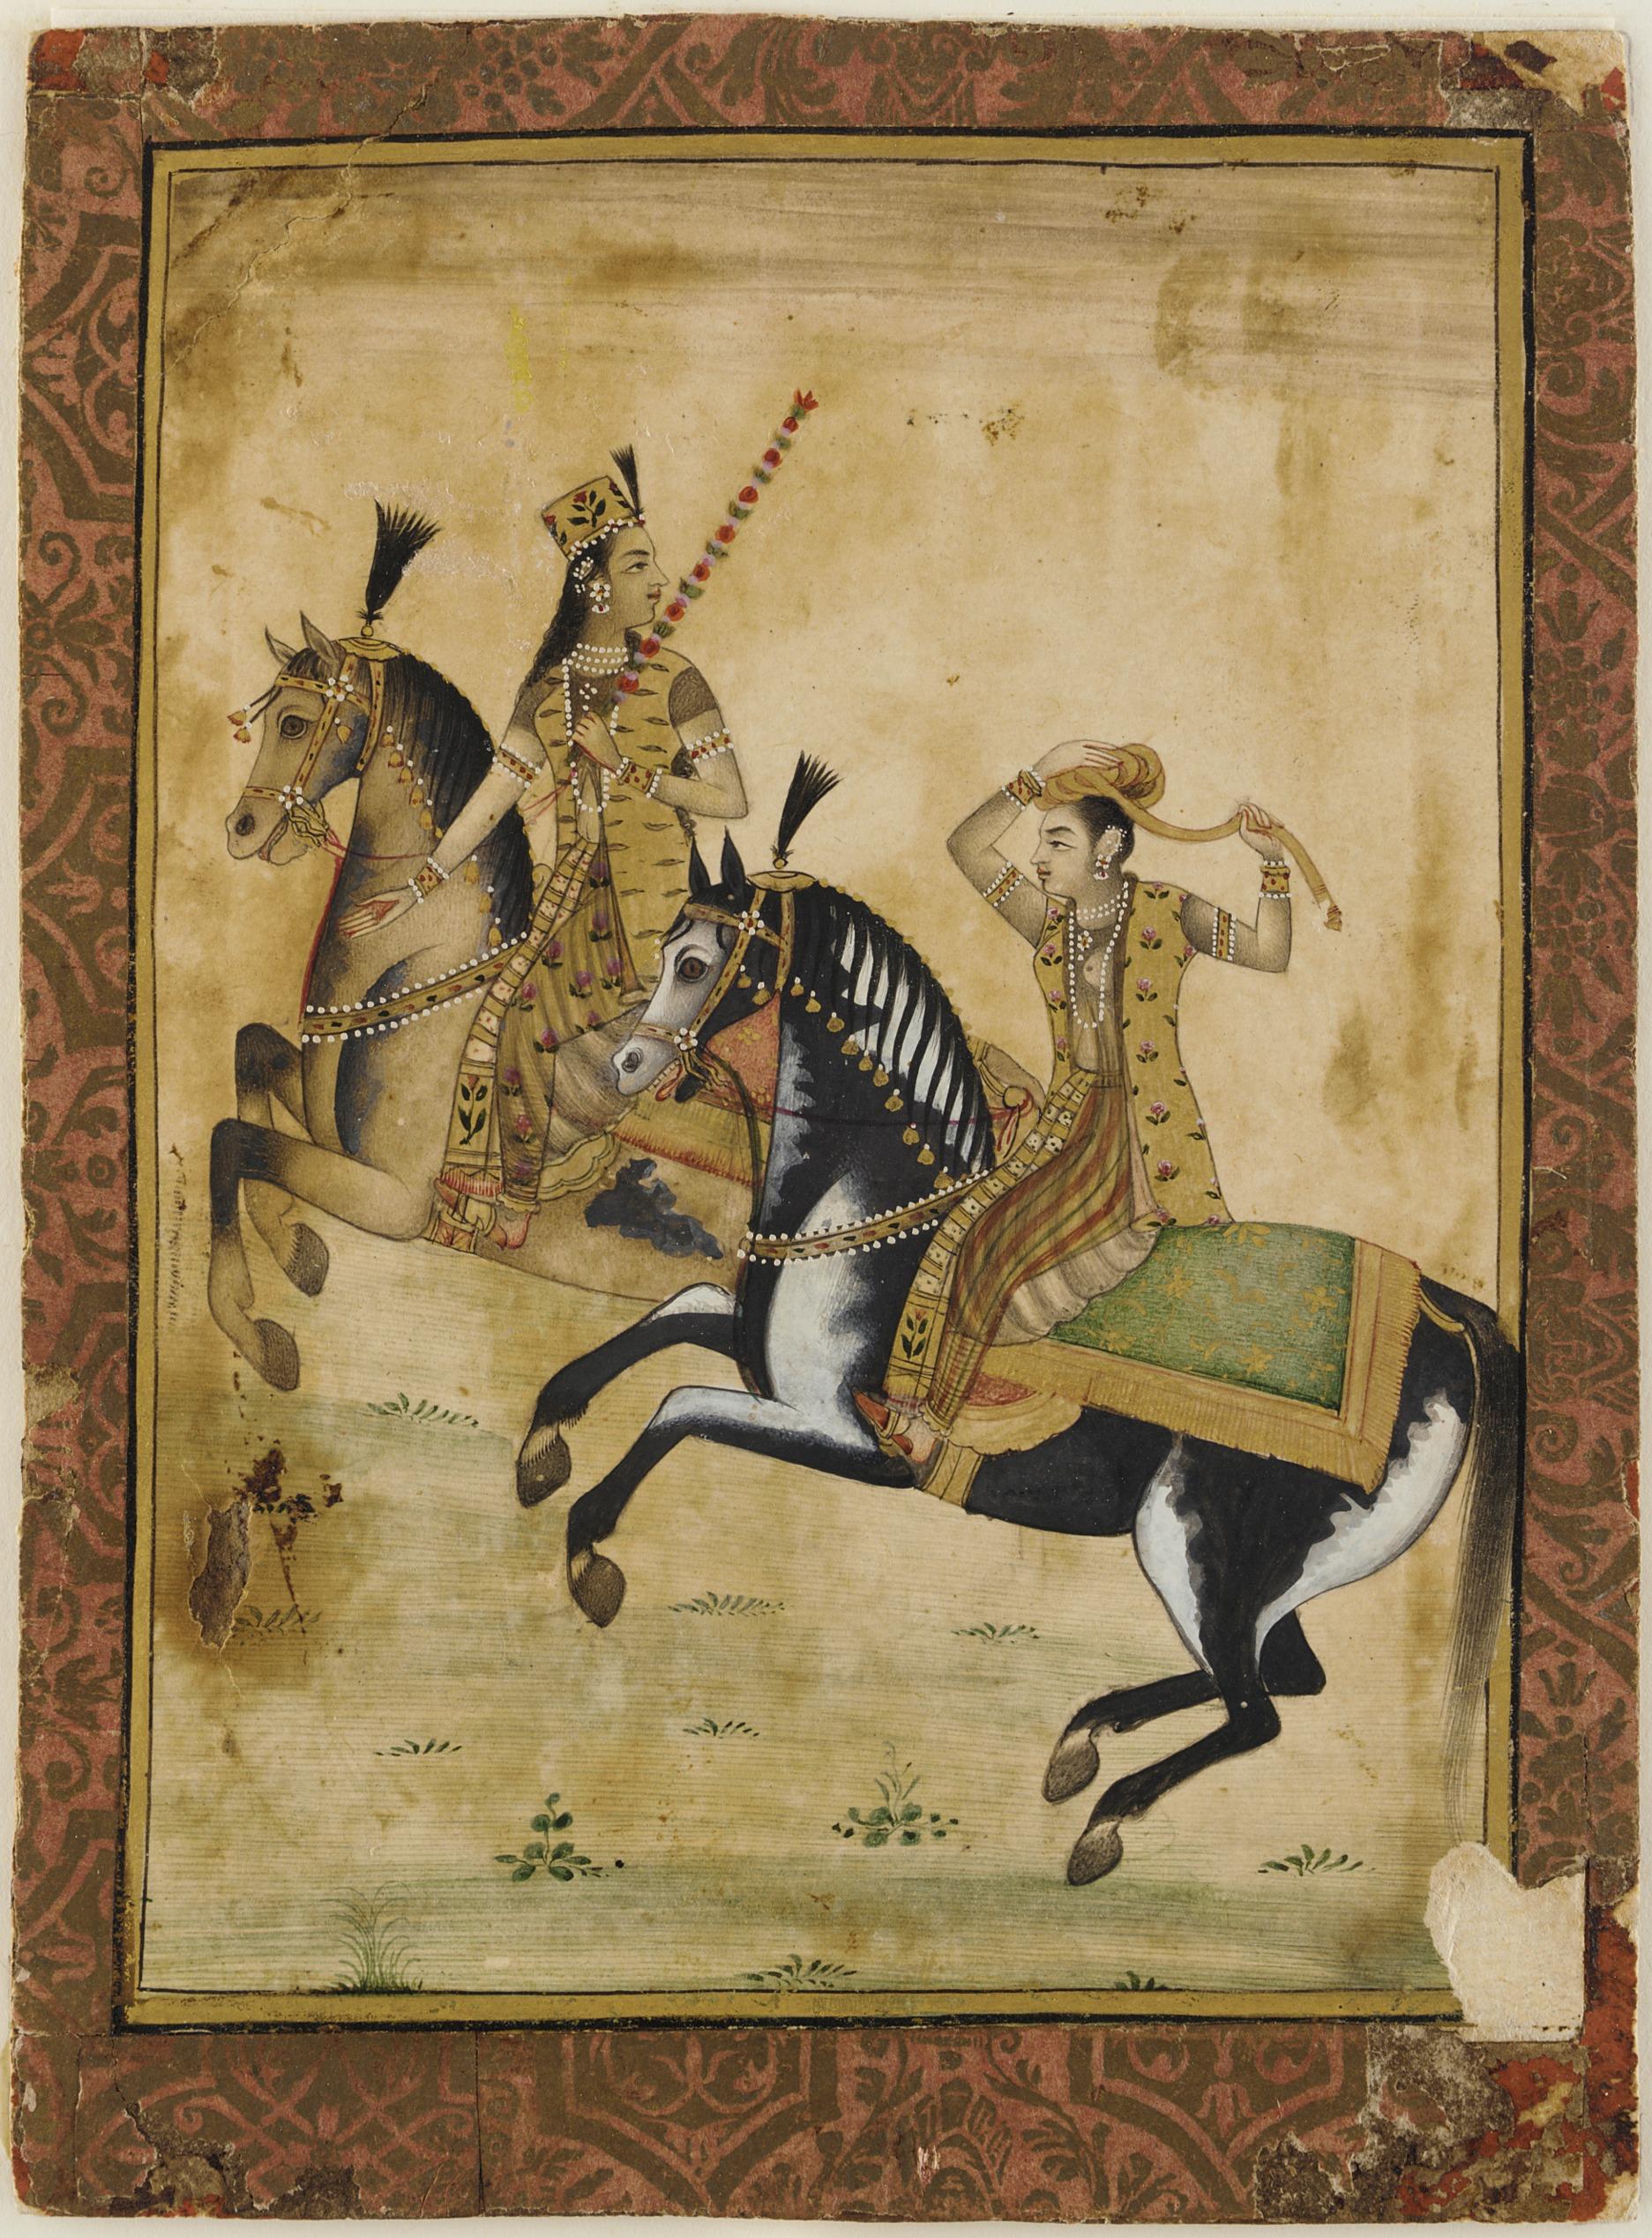 A Prince and princess on horseback, 18th century, Mughal Empire